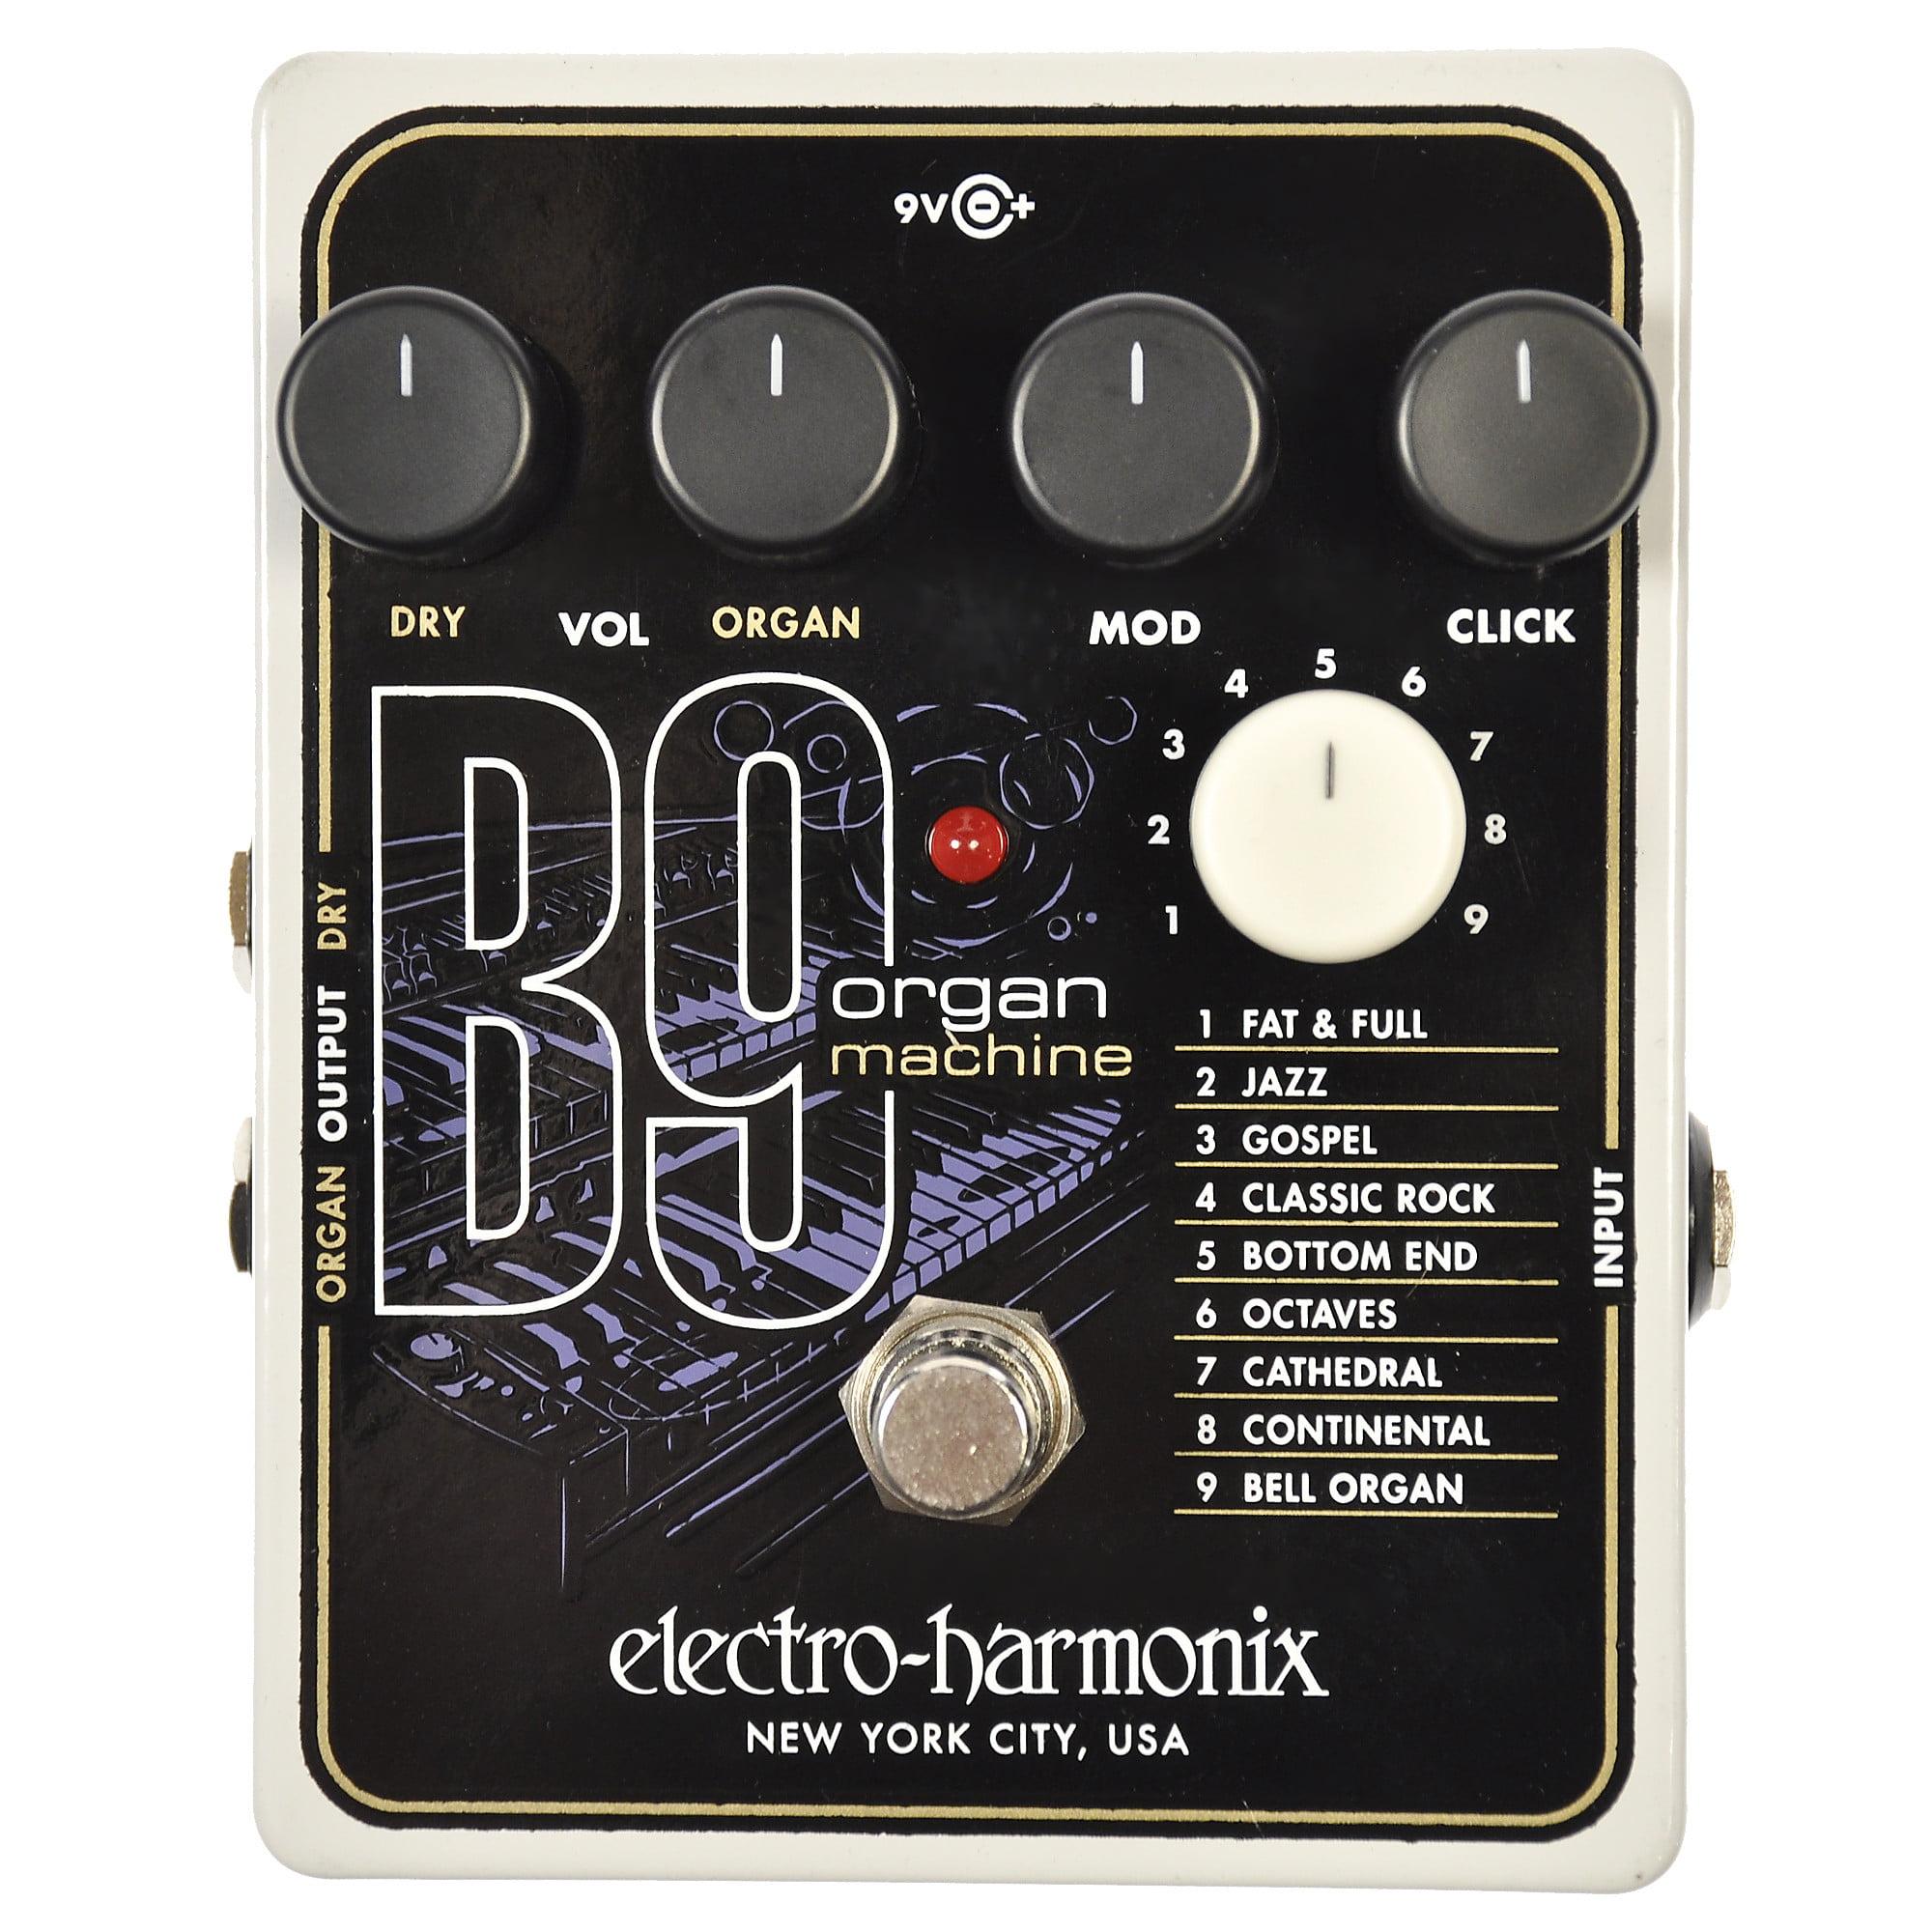 Electro-Harmonix B9 Organ Machine by Electro-Harmonix